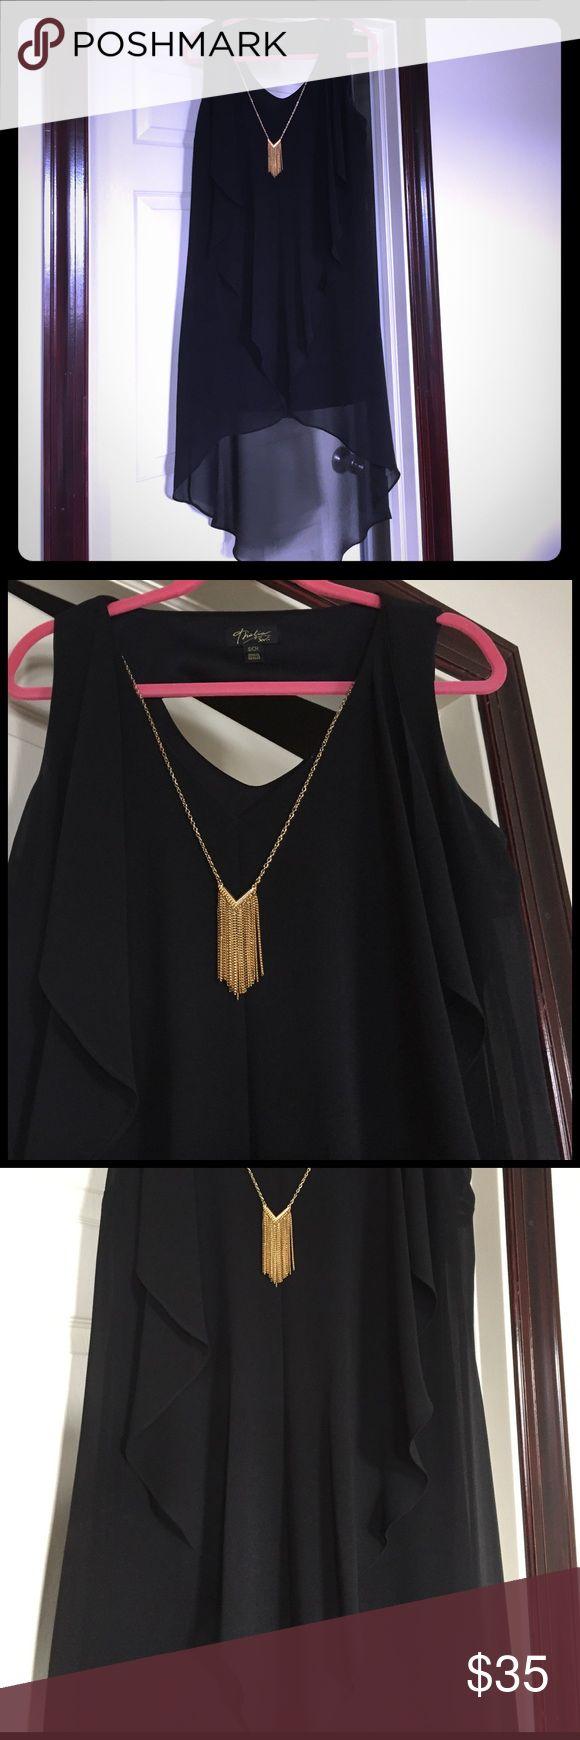 Thalia Sodia black dress Small. NWT Perfect condition Thalia Sodi Dresses